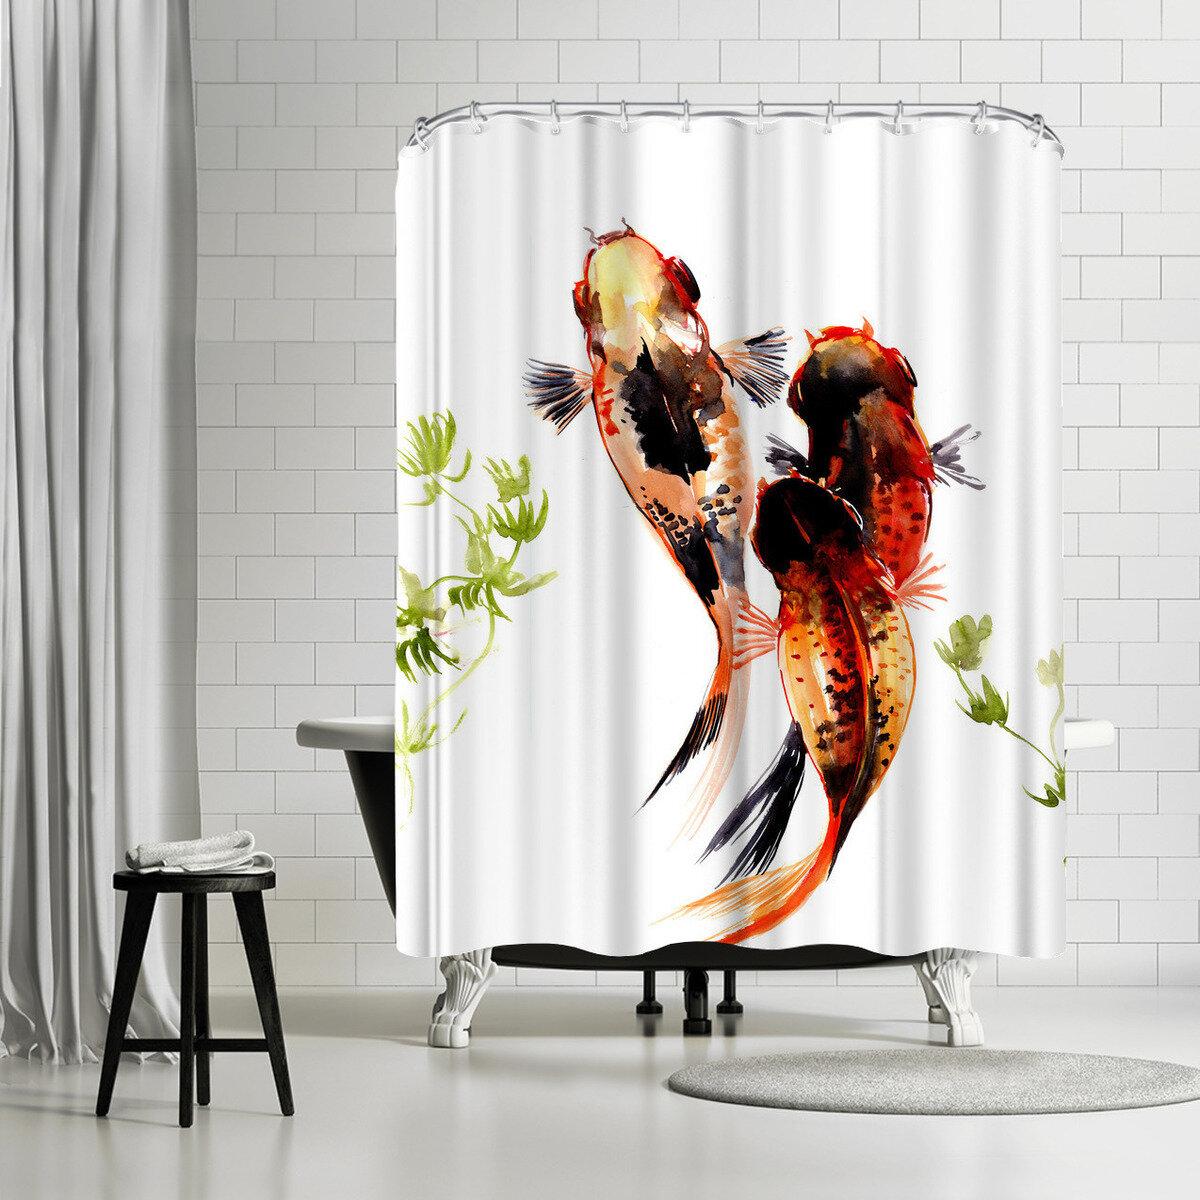 East Urban Home Suren Nersisyan Koi Fish Pond 1 1 Single Shower Curtain Wayfair